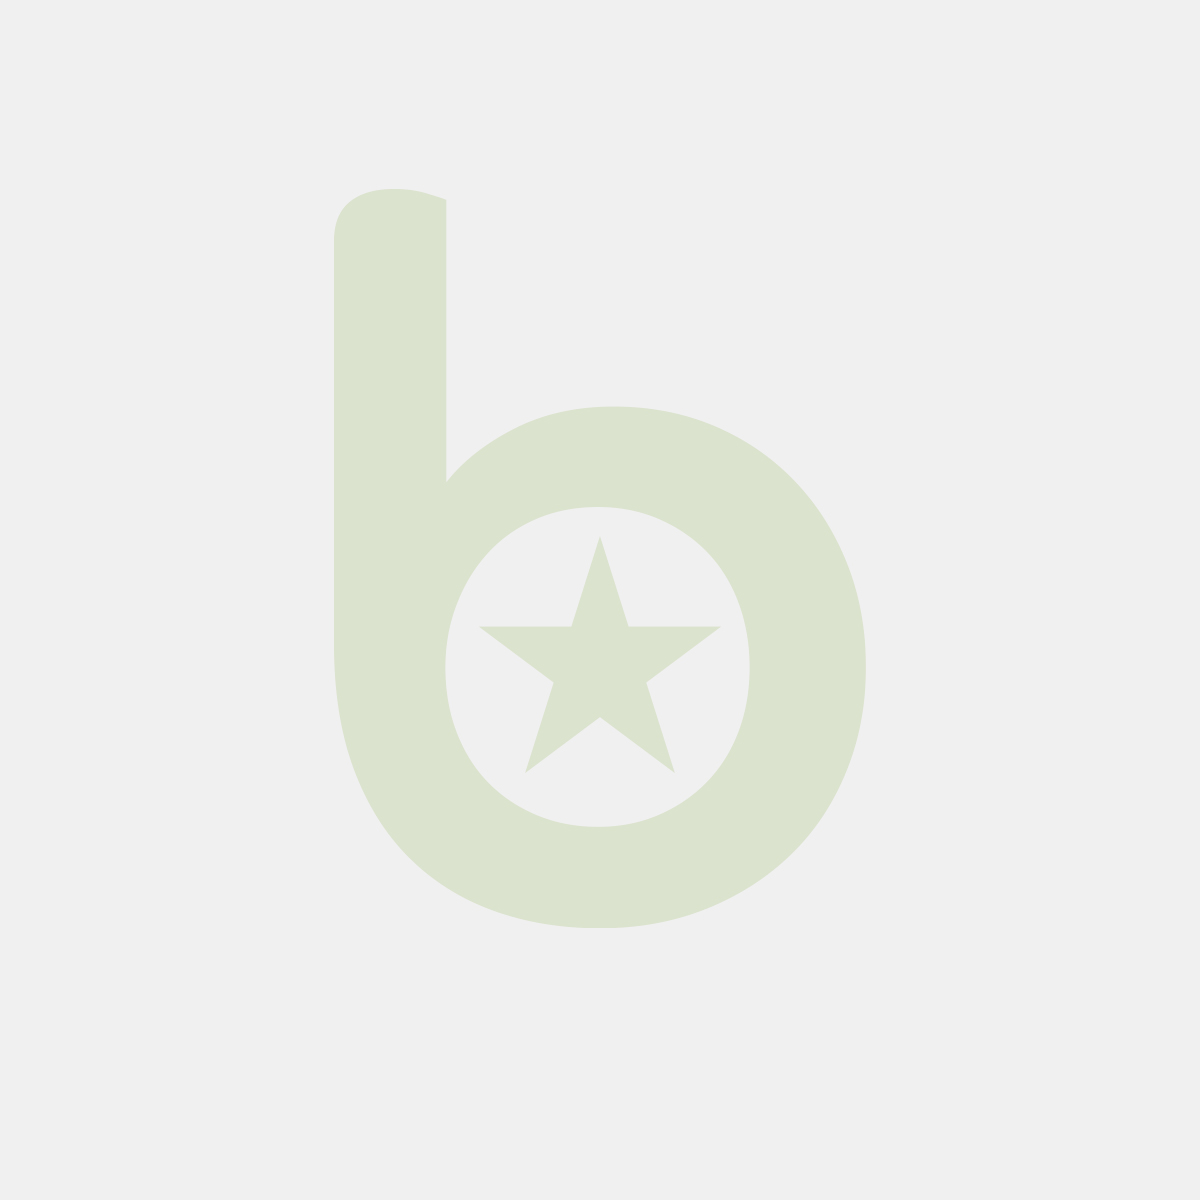 FINGERFOOD - miseczka CORALLO 60ml PS transparentna op. 50 sztuk